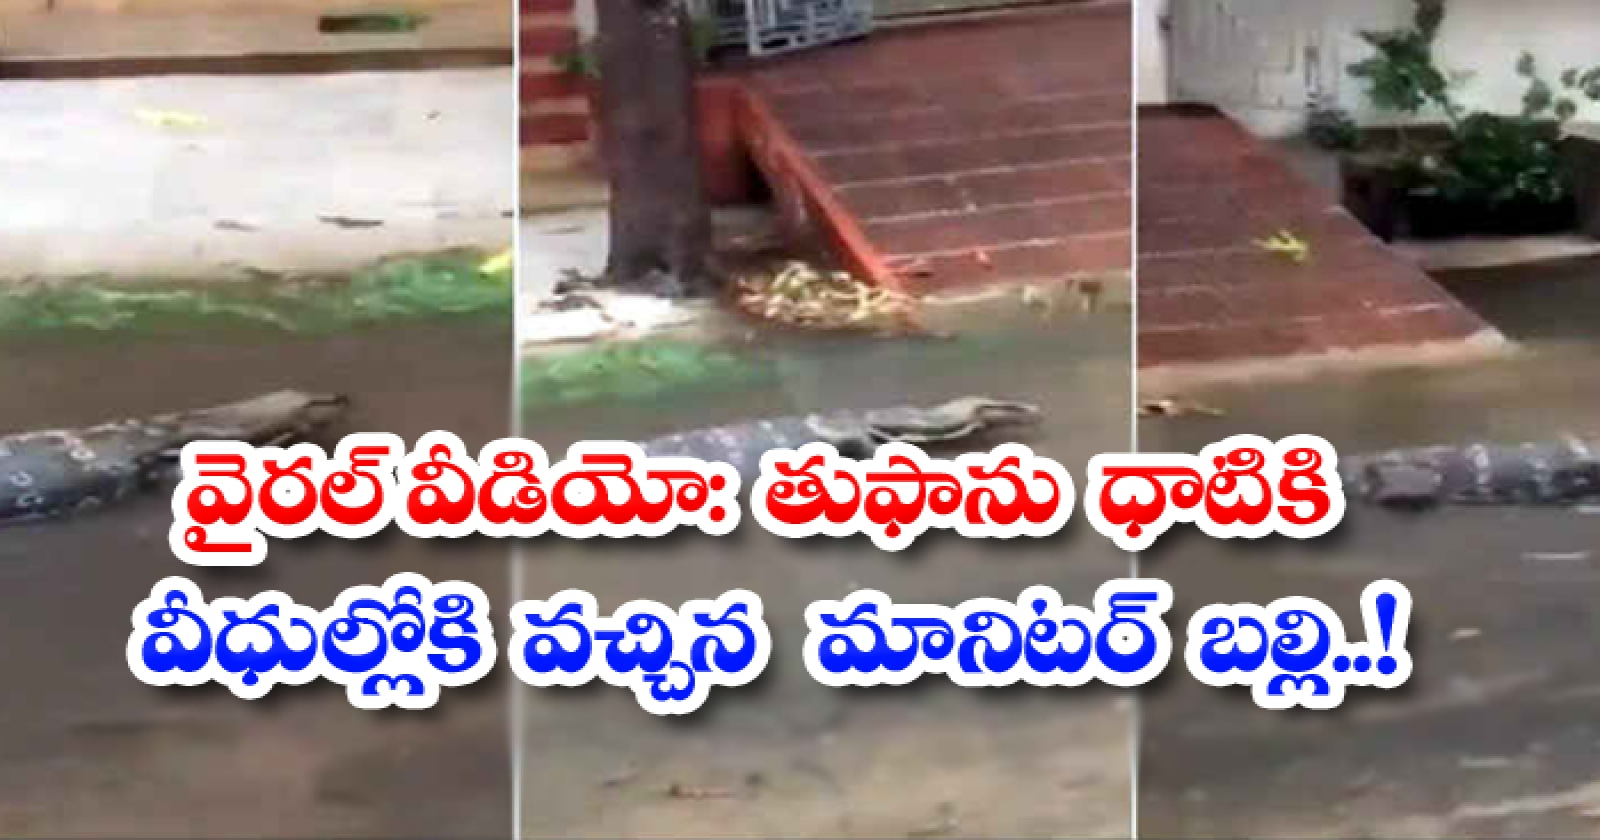 Viral Video Monitor Lizard On The Streets After The Storm-వైరల్ వీడియో: తుఫాను ధాటికి వీధుల్లోకి వచ్చిన మానిటర్ బల్లి..-General-Telugu-Telugu Tollywood Photo Image-TeluguStop.com